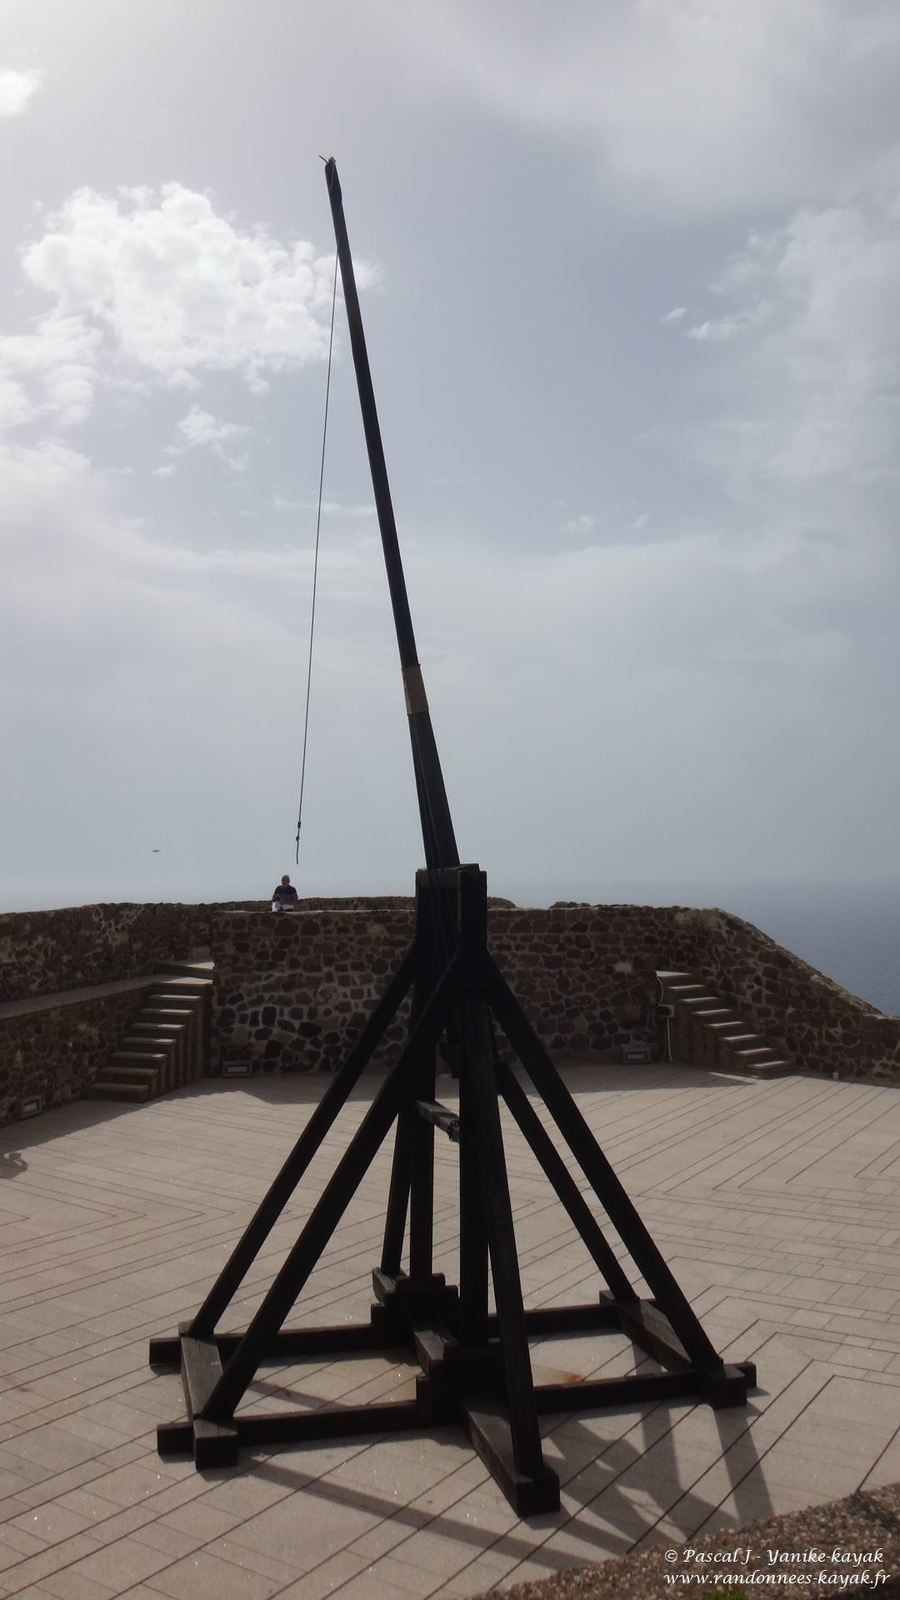 Sardegna 2019, una nuova avventura - Chapitre 17 - Vers Porto Torres, via Castelsardo